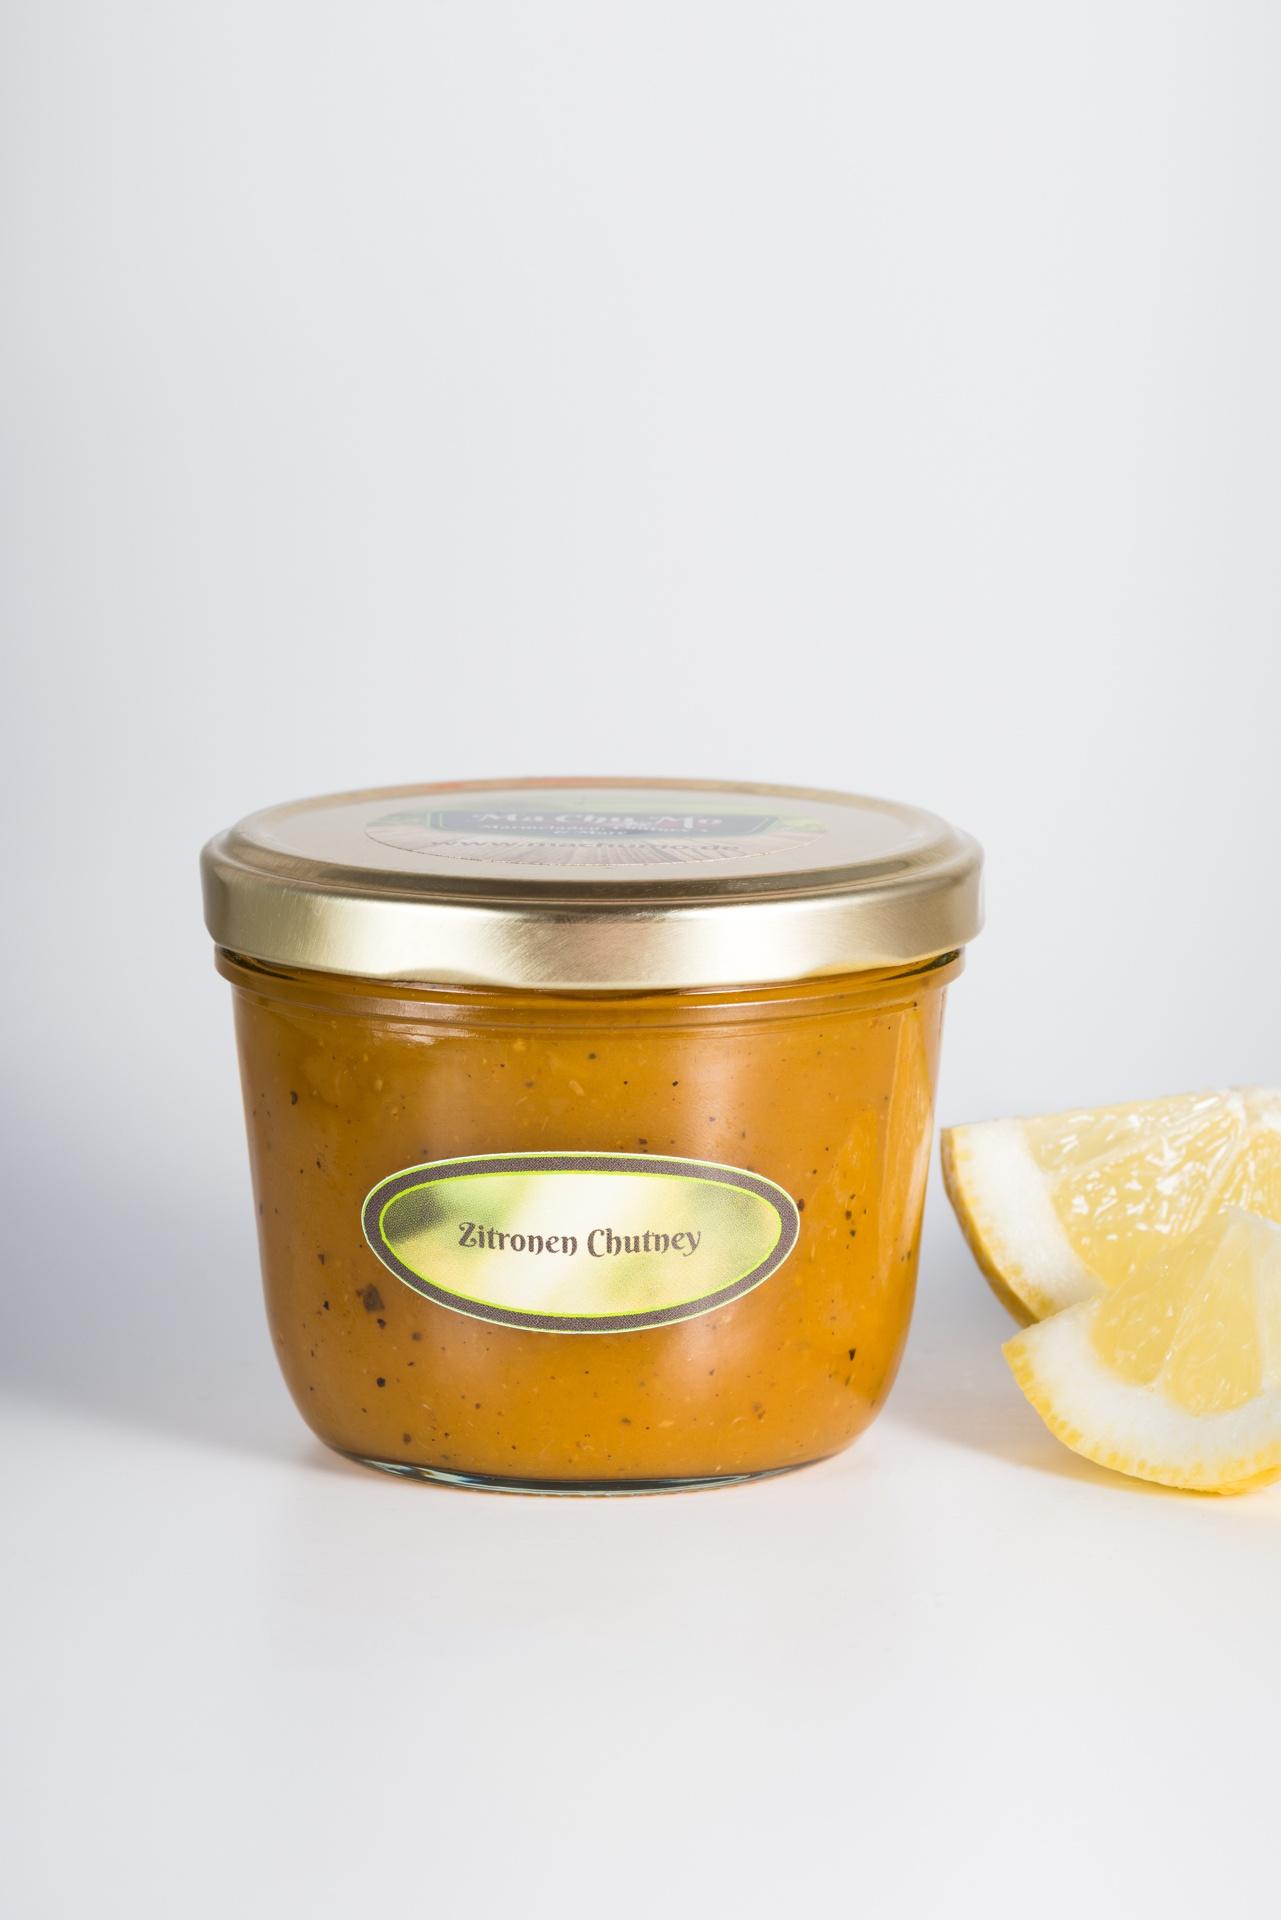 Zitronen Chutney